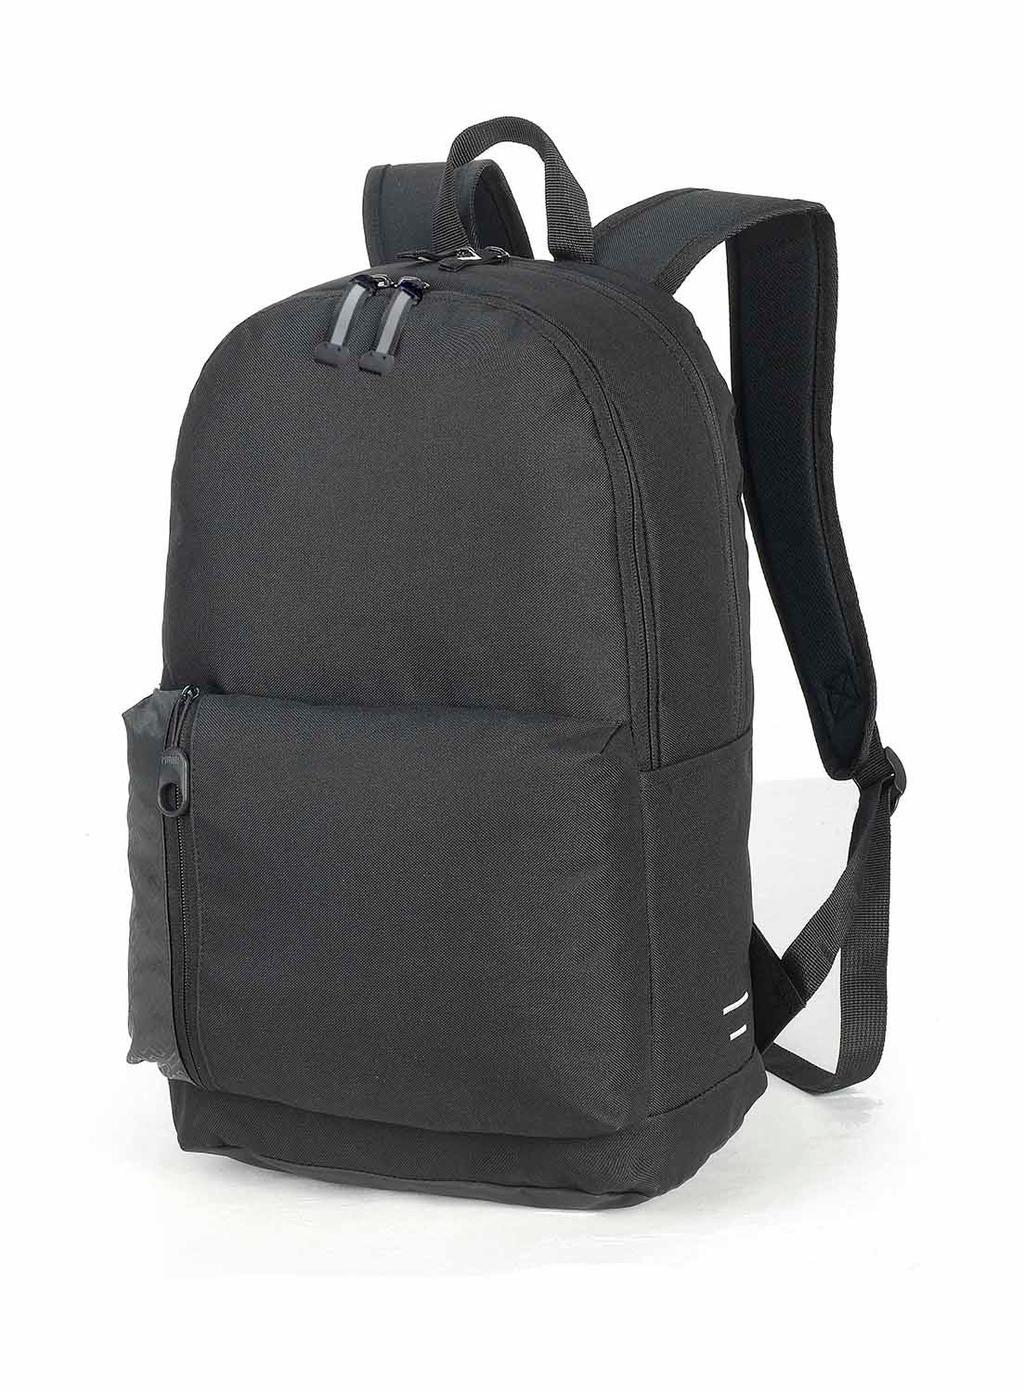 Plymouth Students Backpack - zvìtšit obrázek